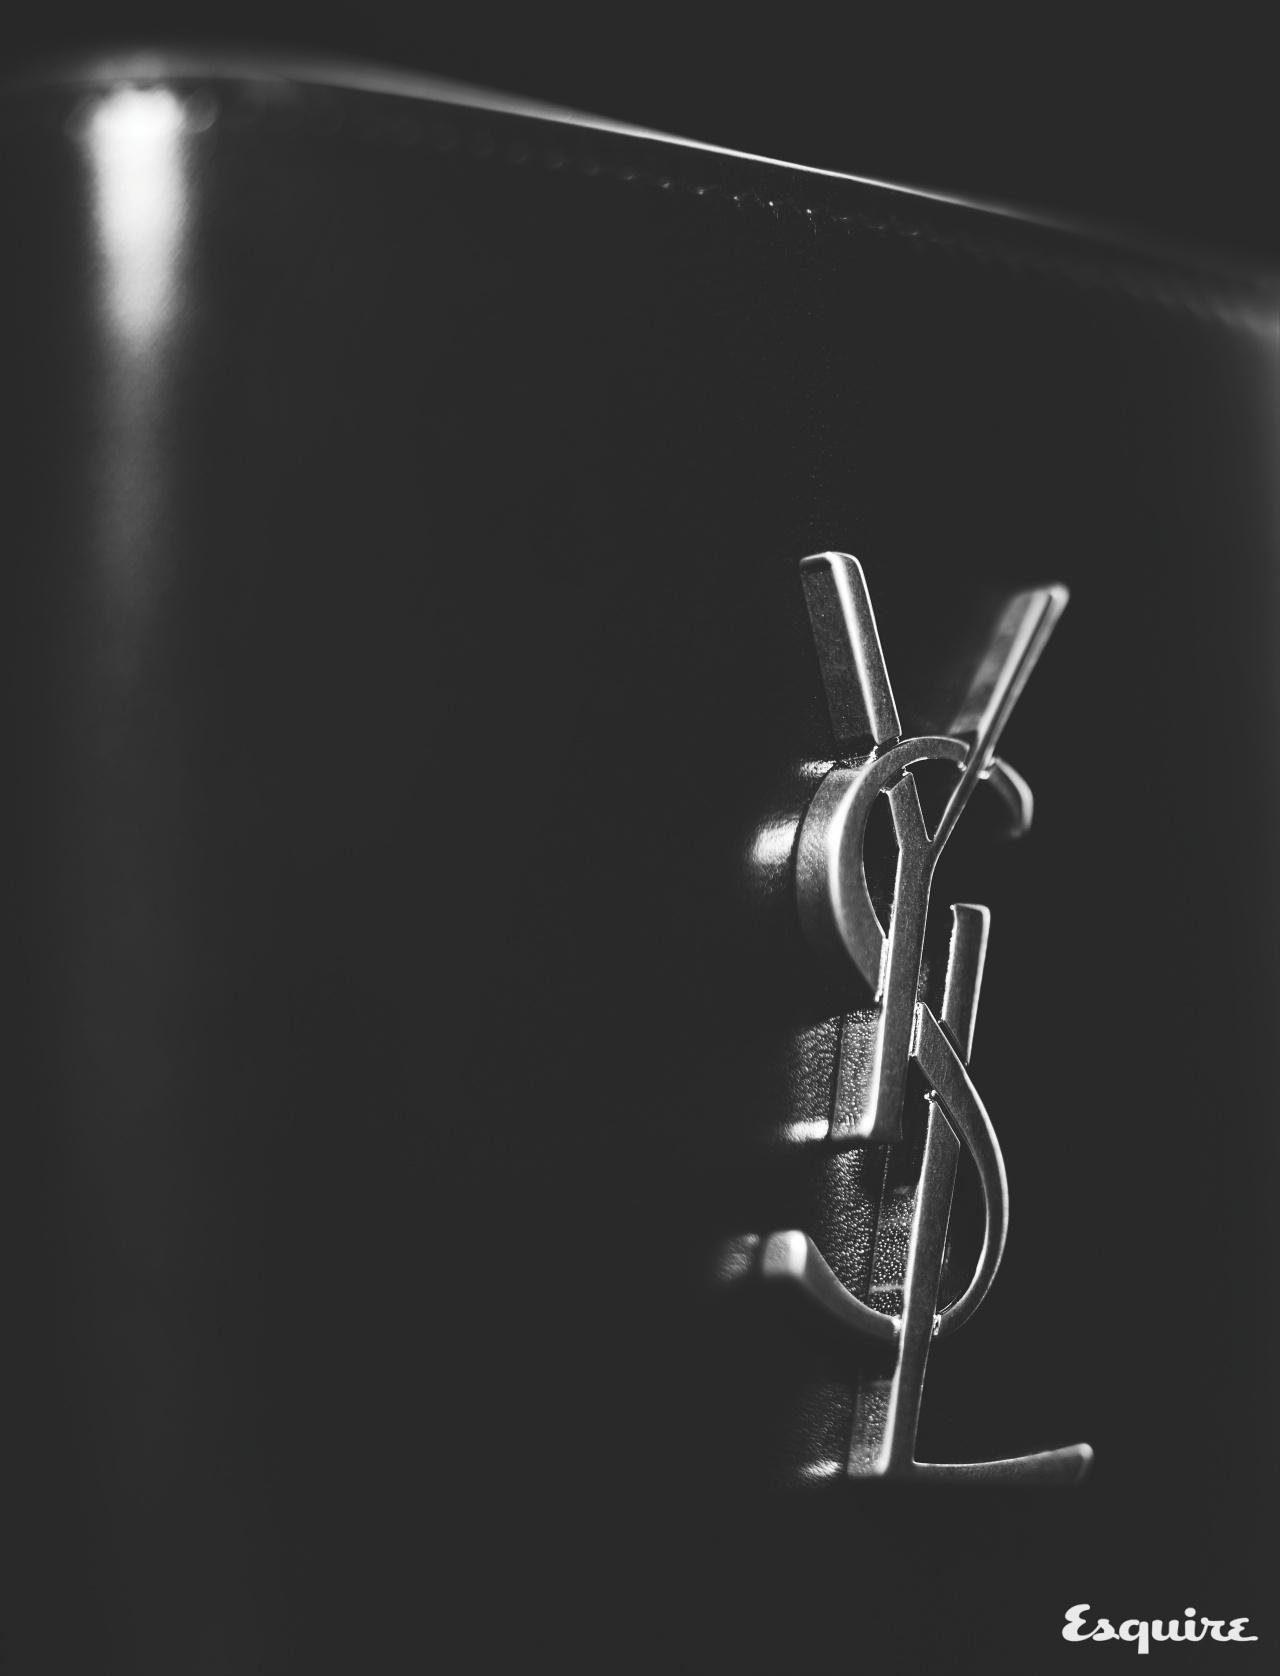 SAINT LAURENT BY ANTHONY VACARELLO 입체적인 금속 카산드라 로고를 정결한 송아지 가죽 지갑에 대범하게 장식했다. 60만원  생 로랑 by 안토니 바카렐로.